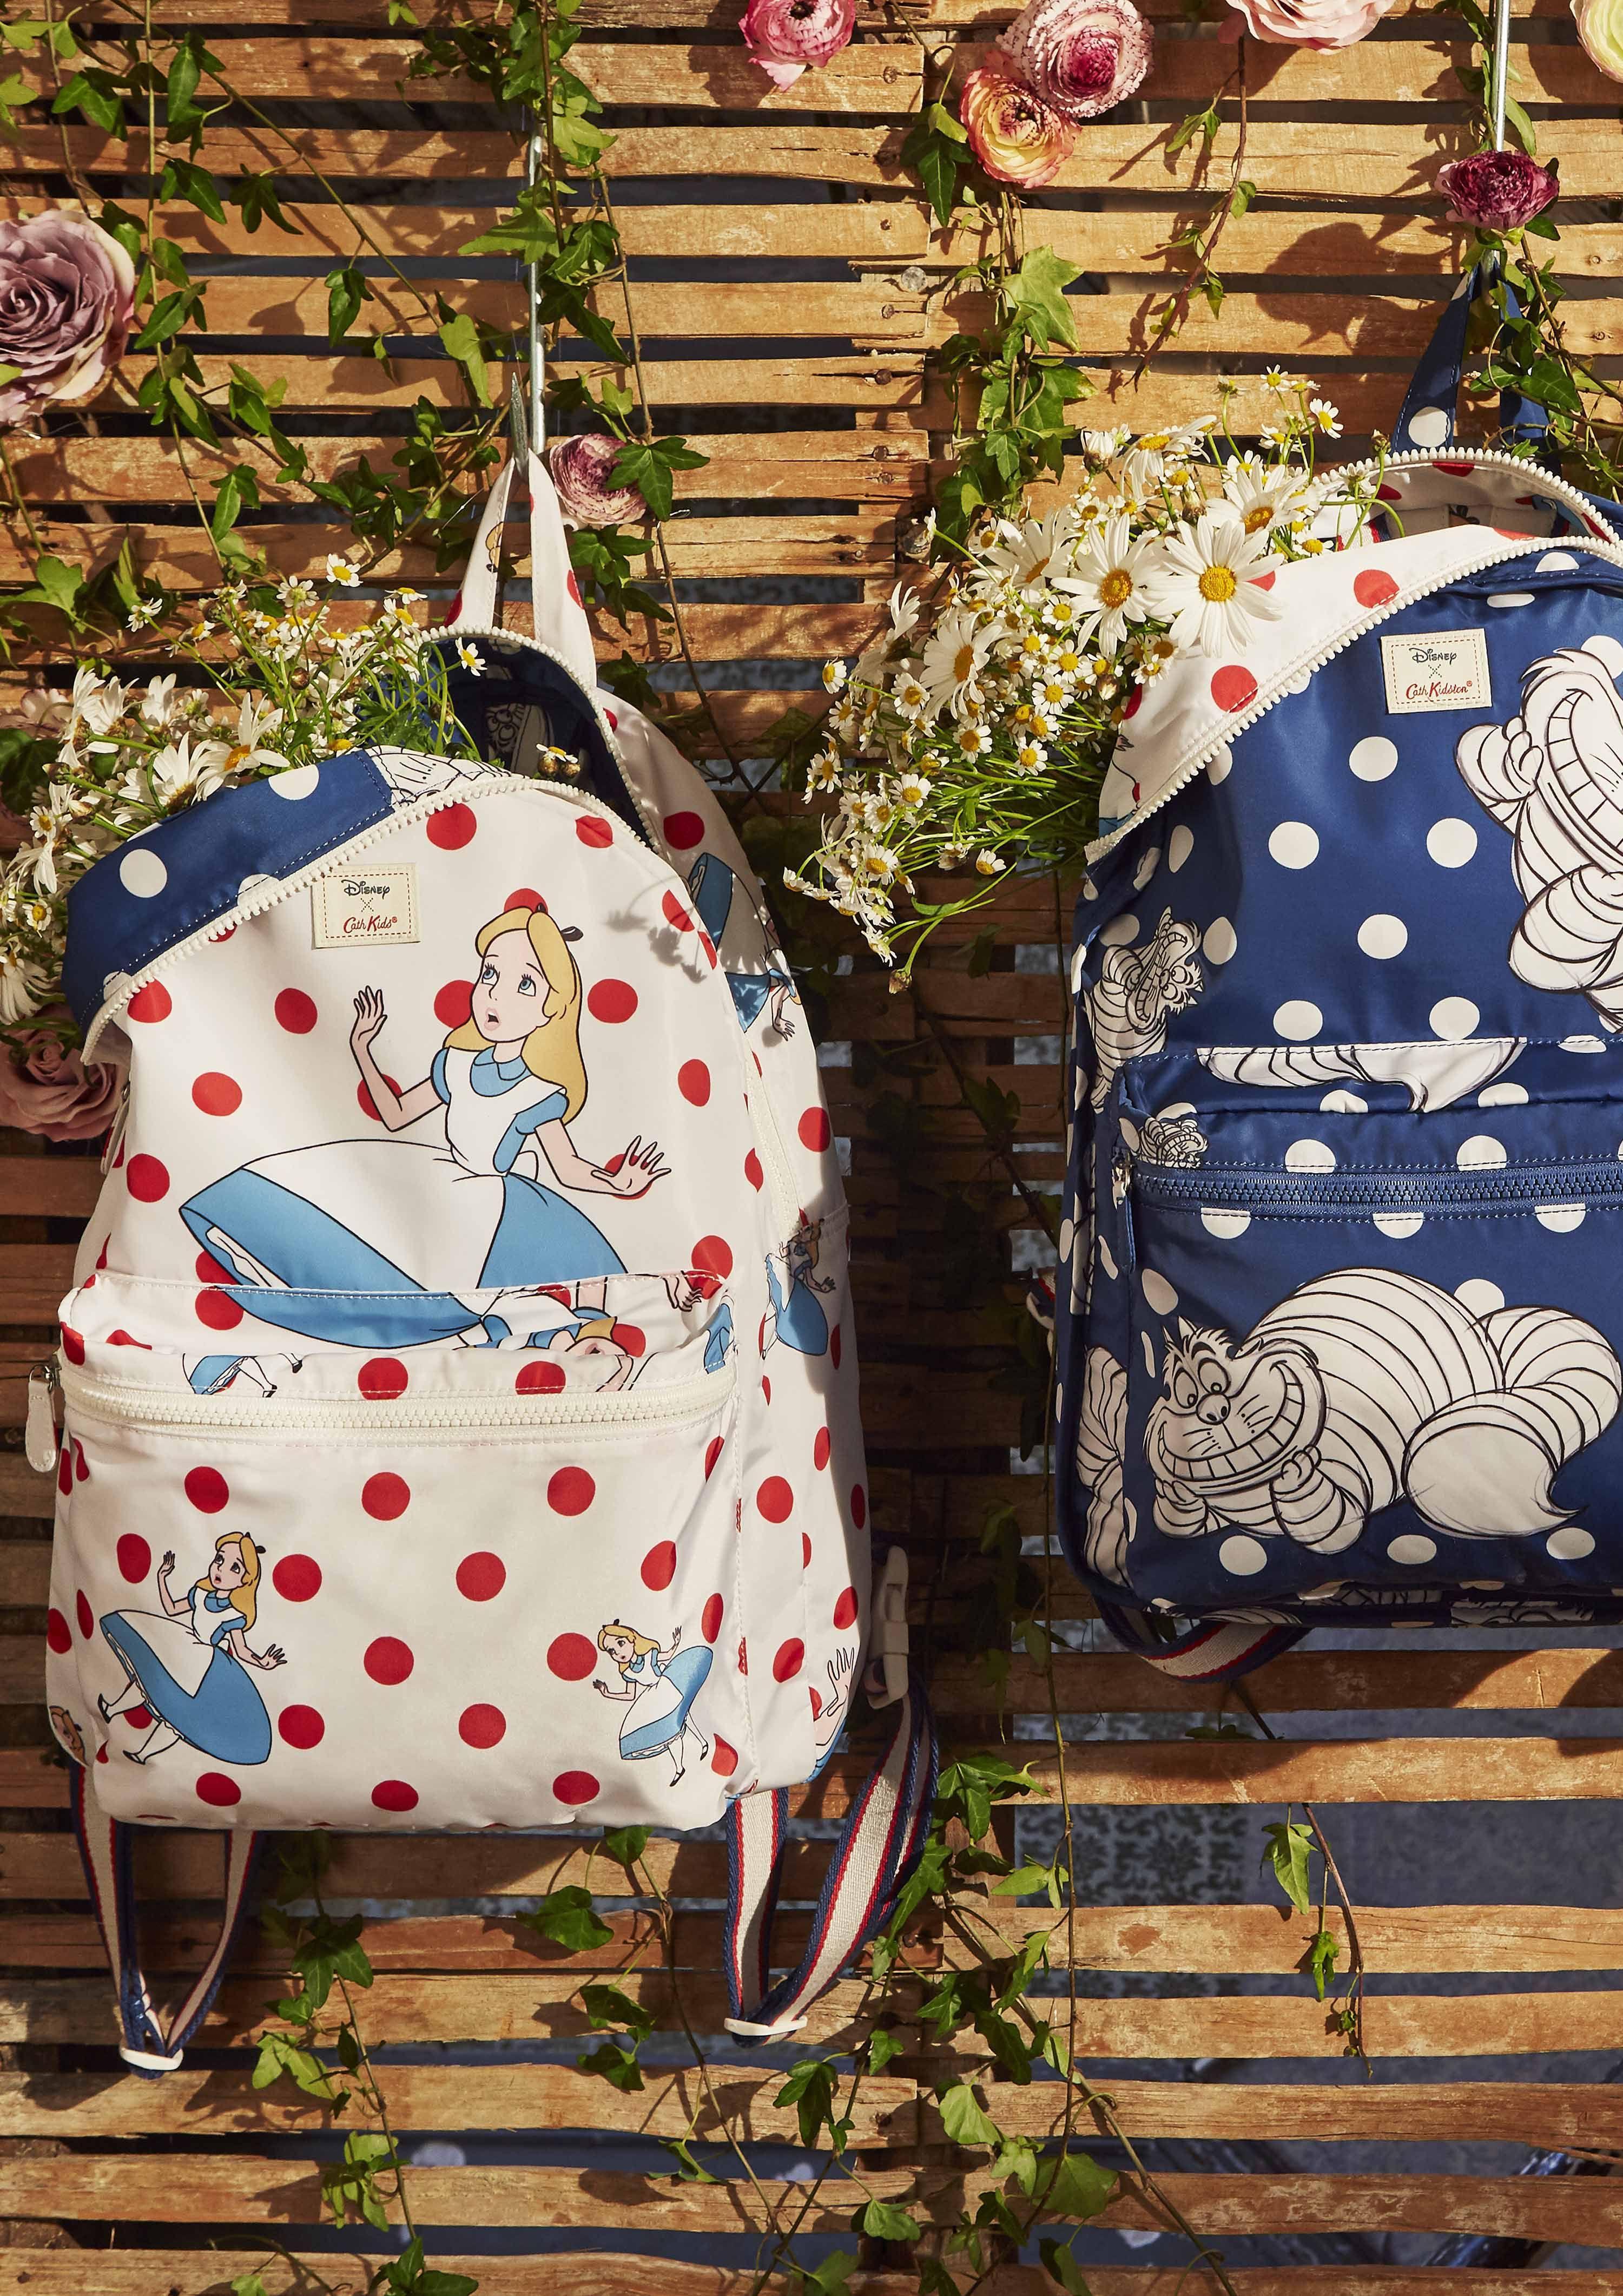 GIFT ***SALE***Cath Kidston Backpack Disney Alice in Wonderland